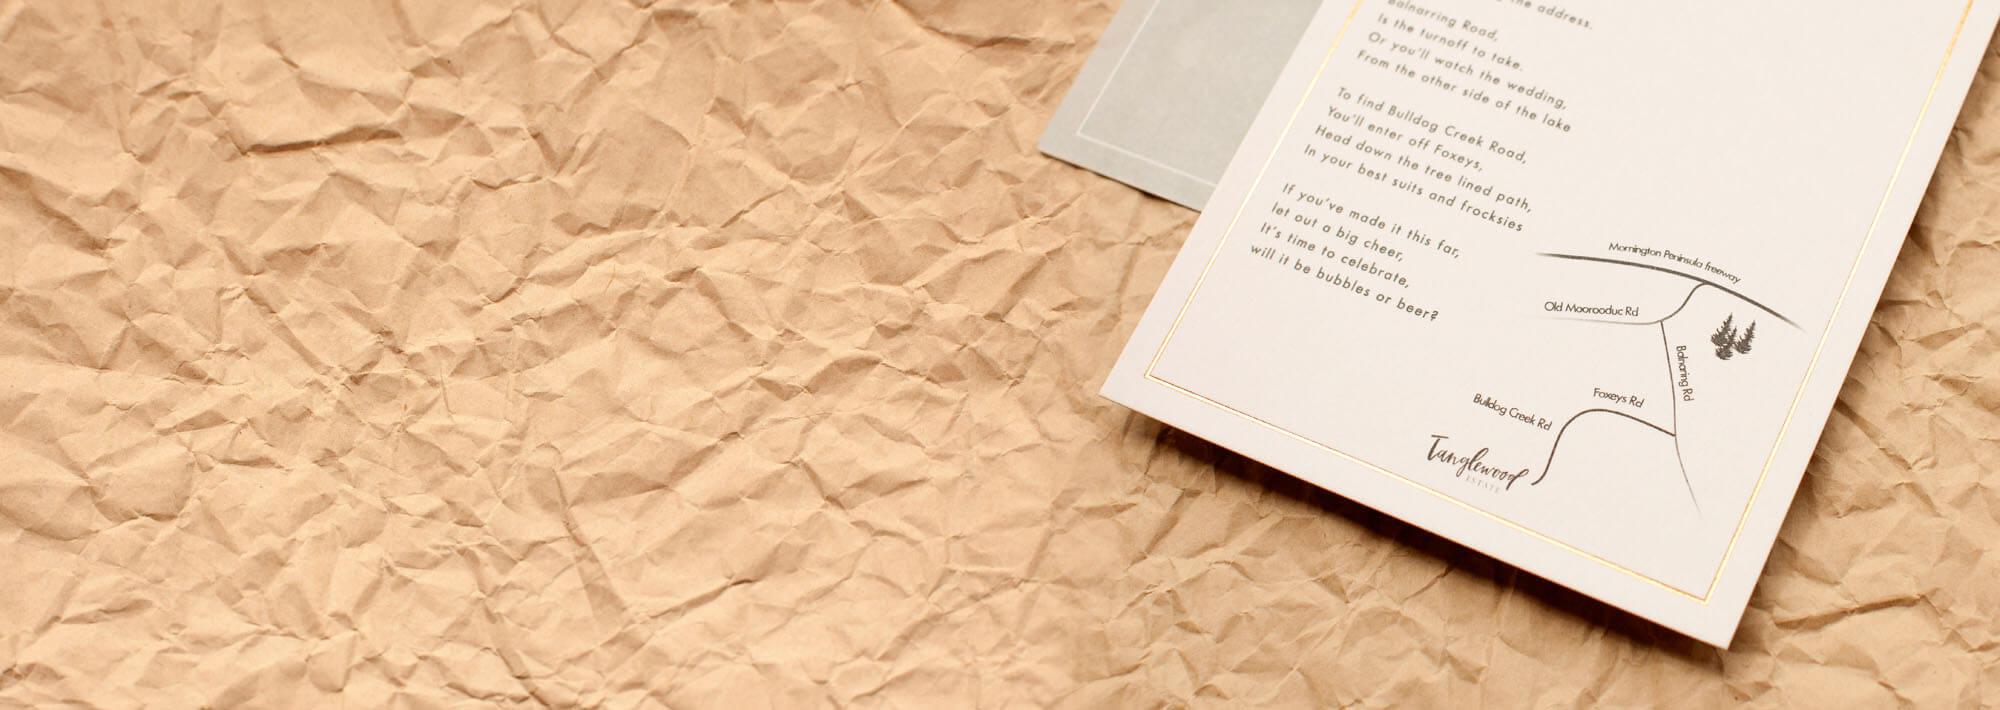 a1b6c8cc00 Custom Wedding Invitations | Custom Made By Designer With Paperlust ...